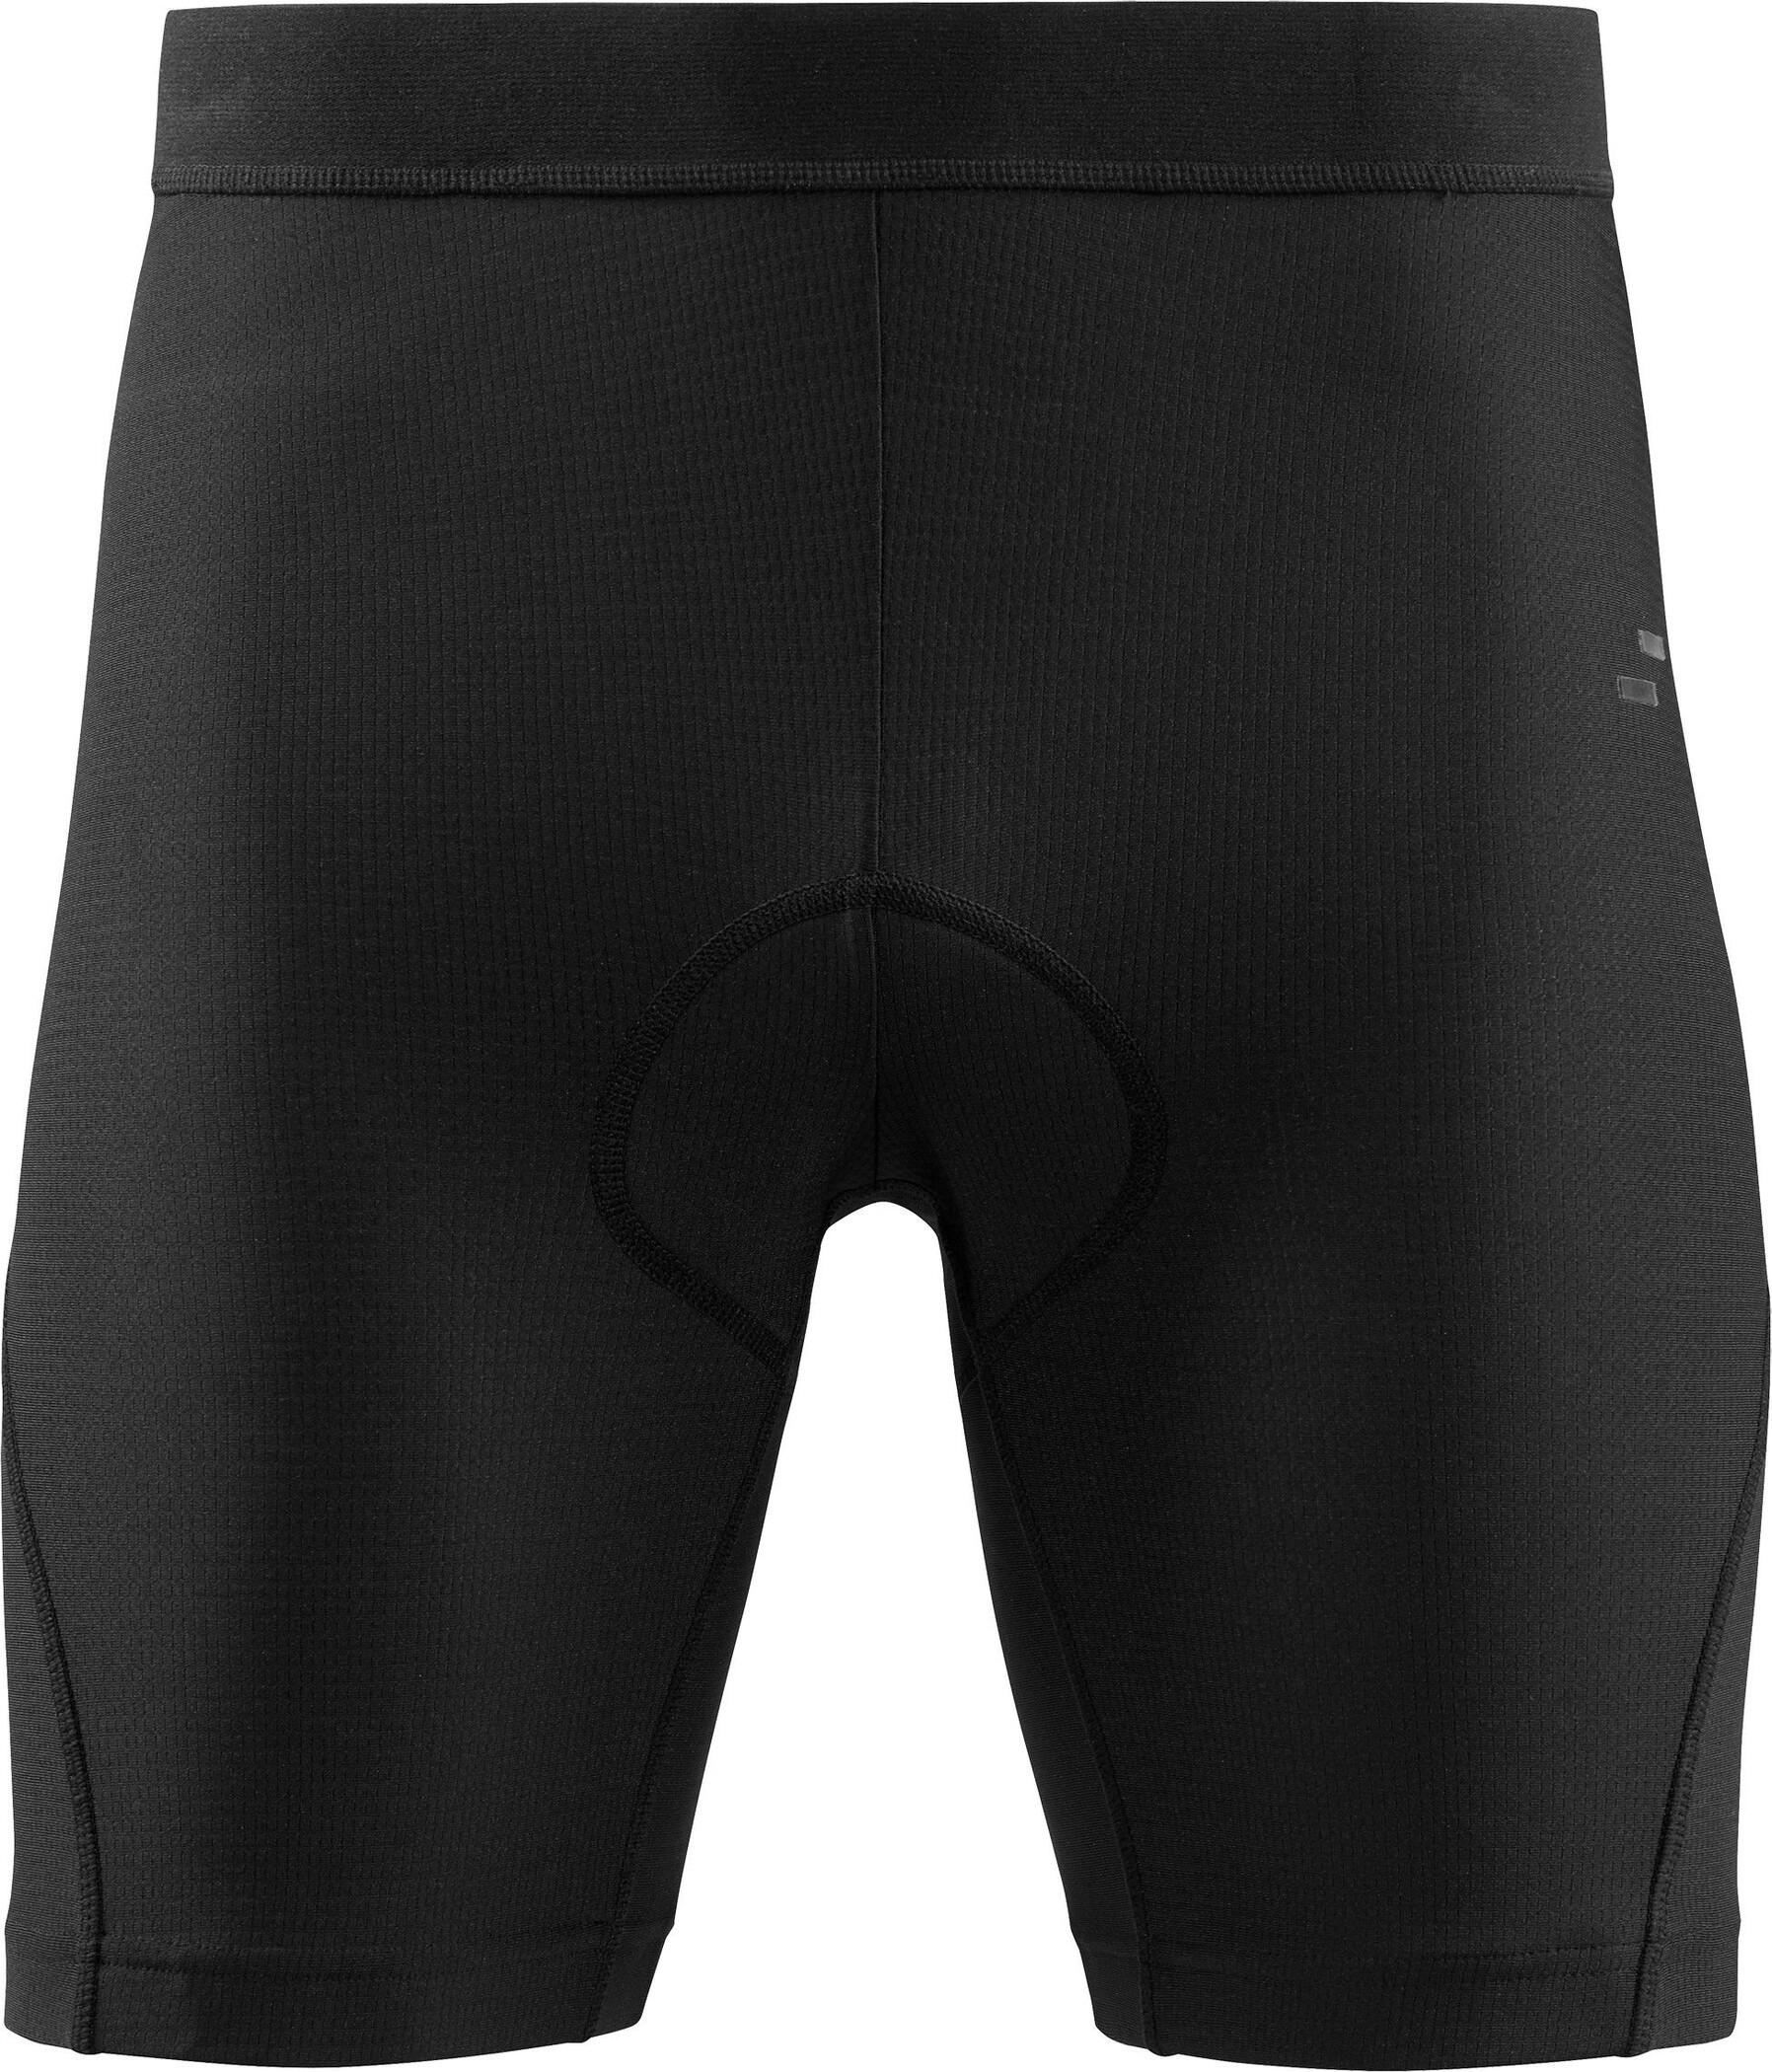 SQUARE Active Cykelundertøj Herrer, black (2020) | Trousers